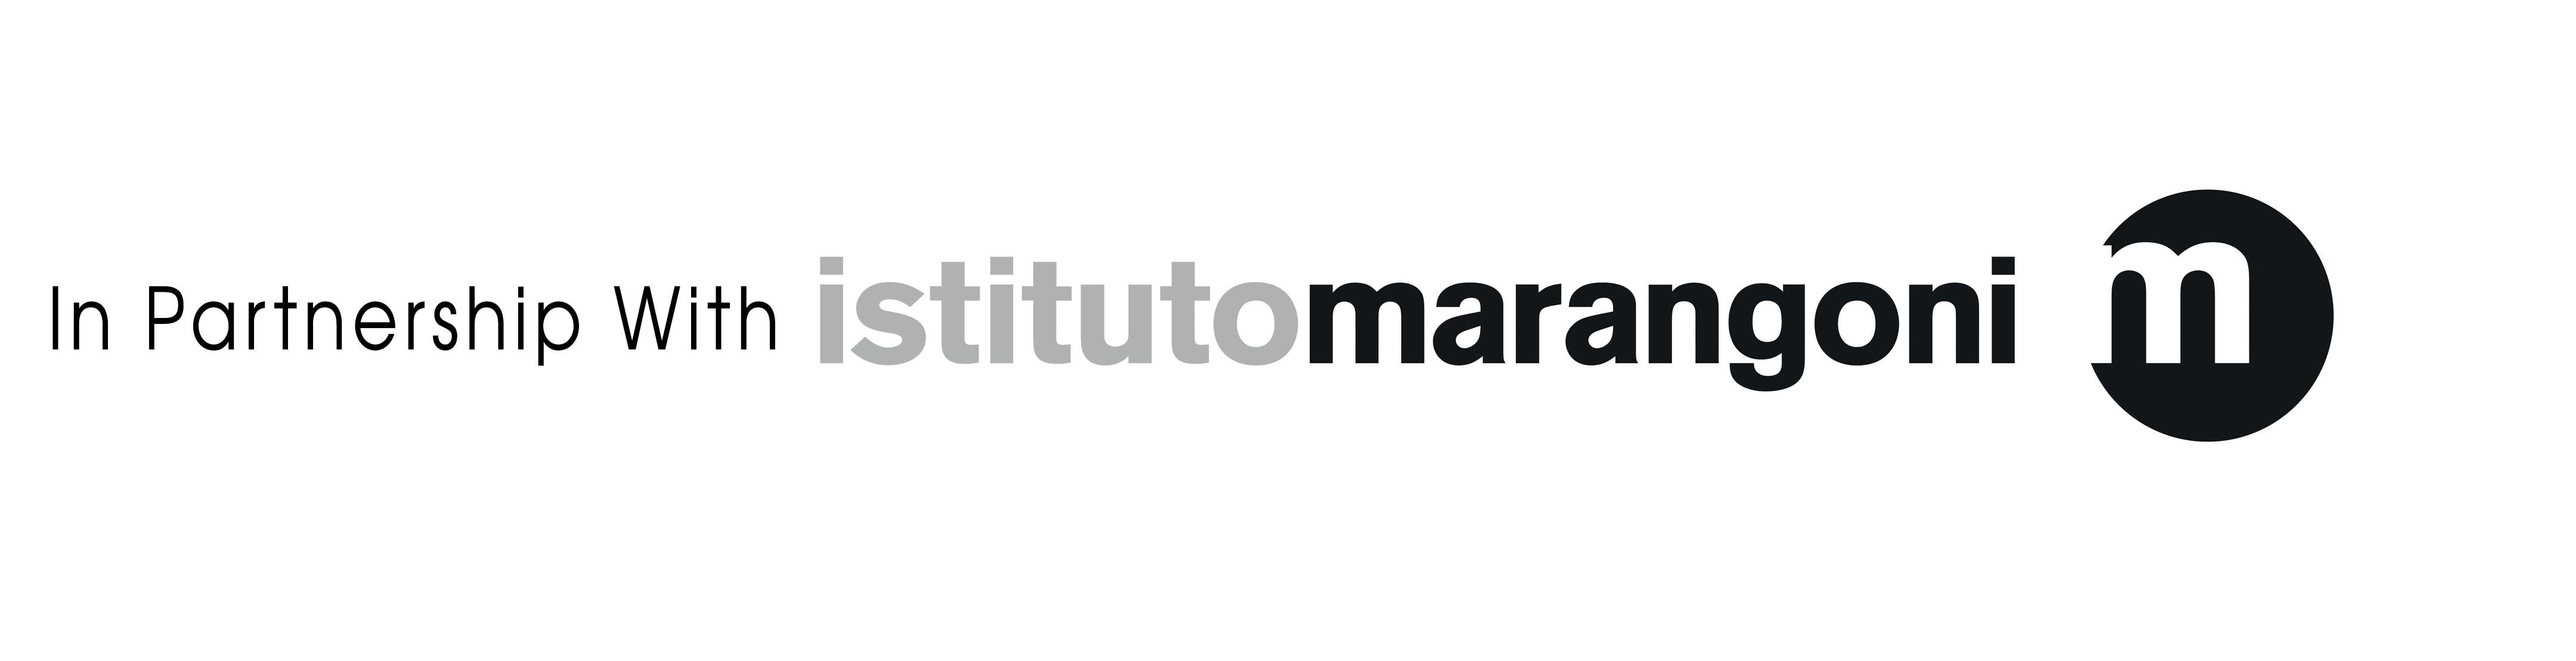 istituto-marangoni-ipw